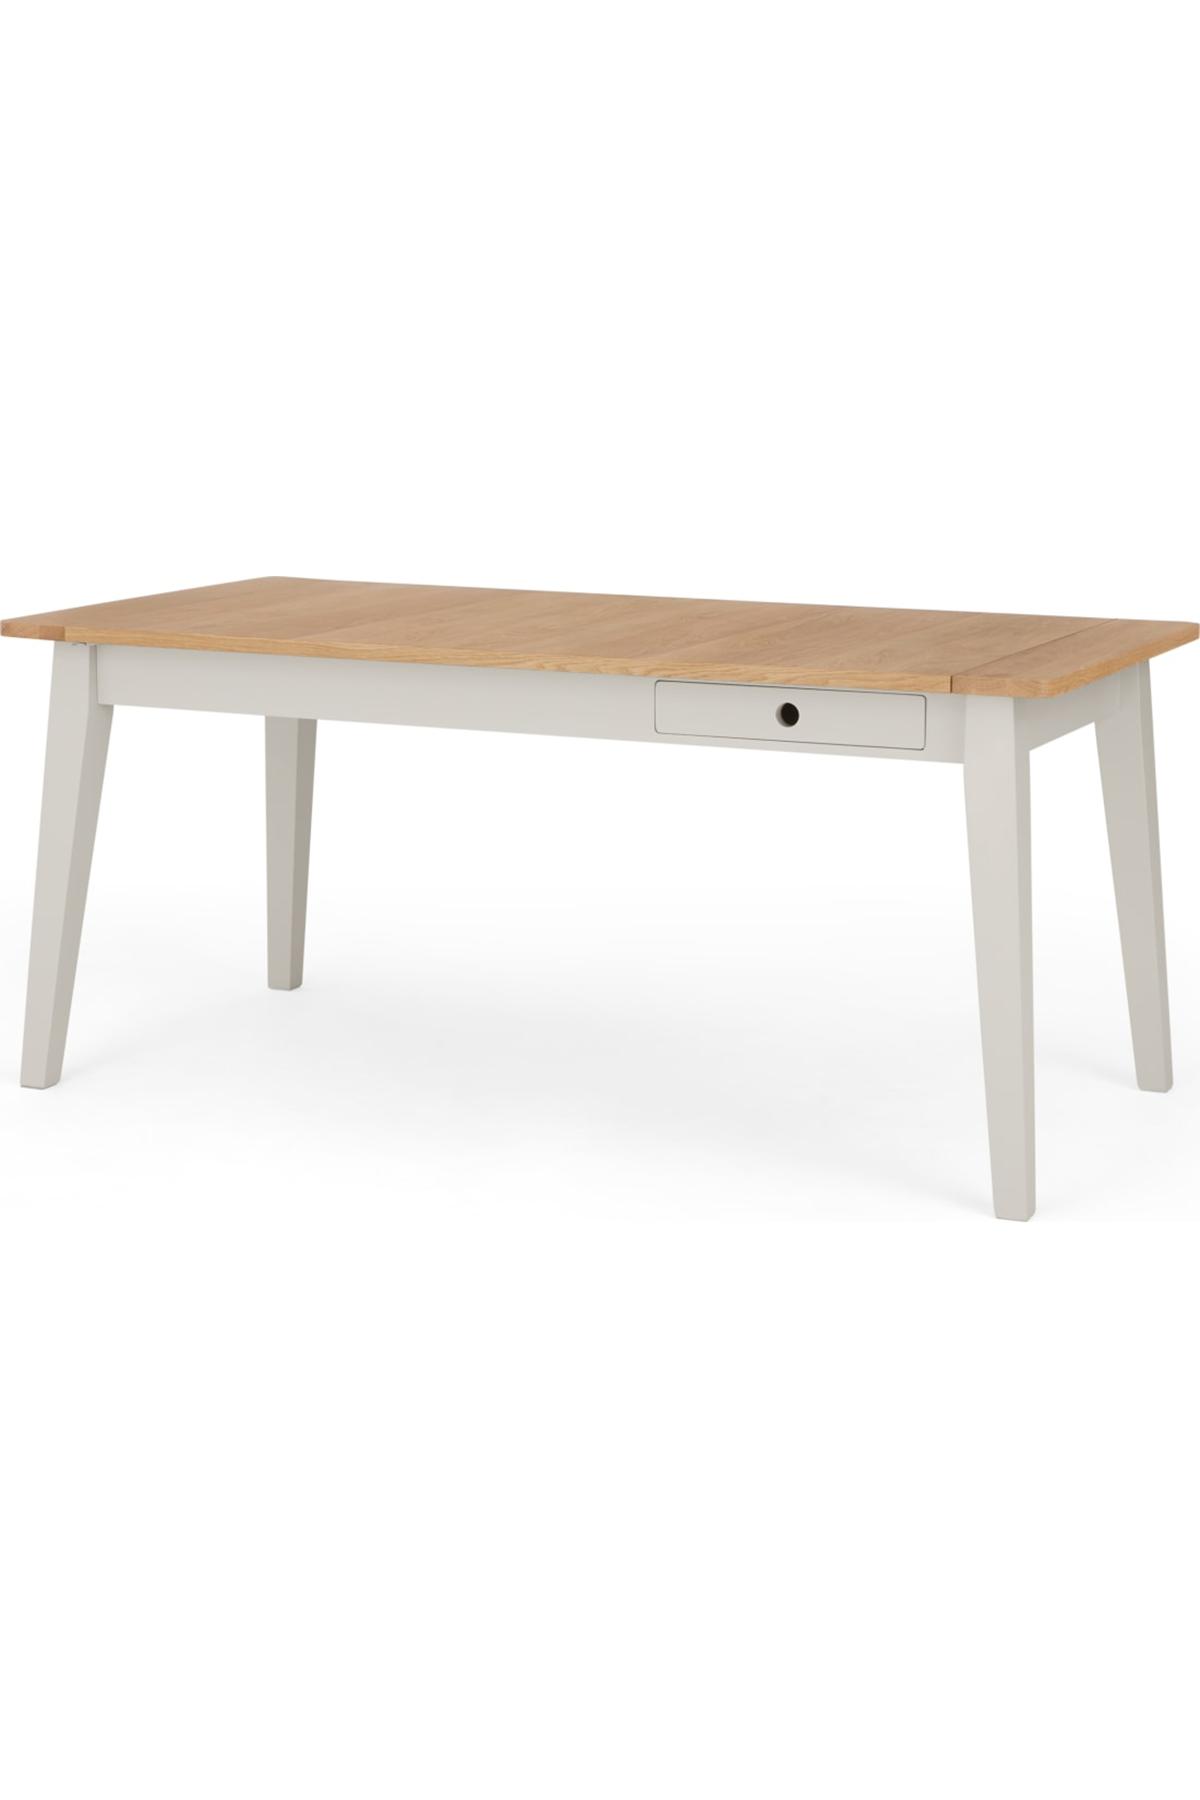 Ralph 6 8 Seat Extending Dining Table Mushroom Grey Light Wood